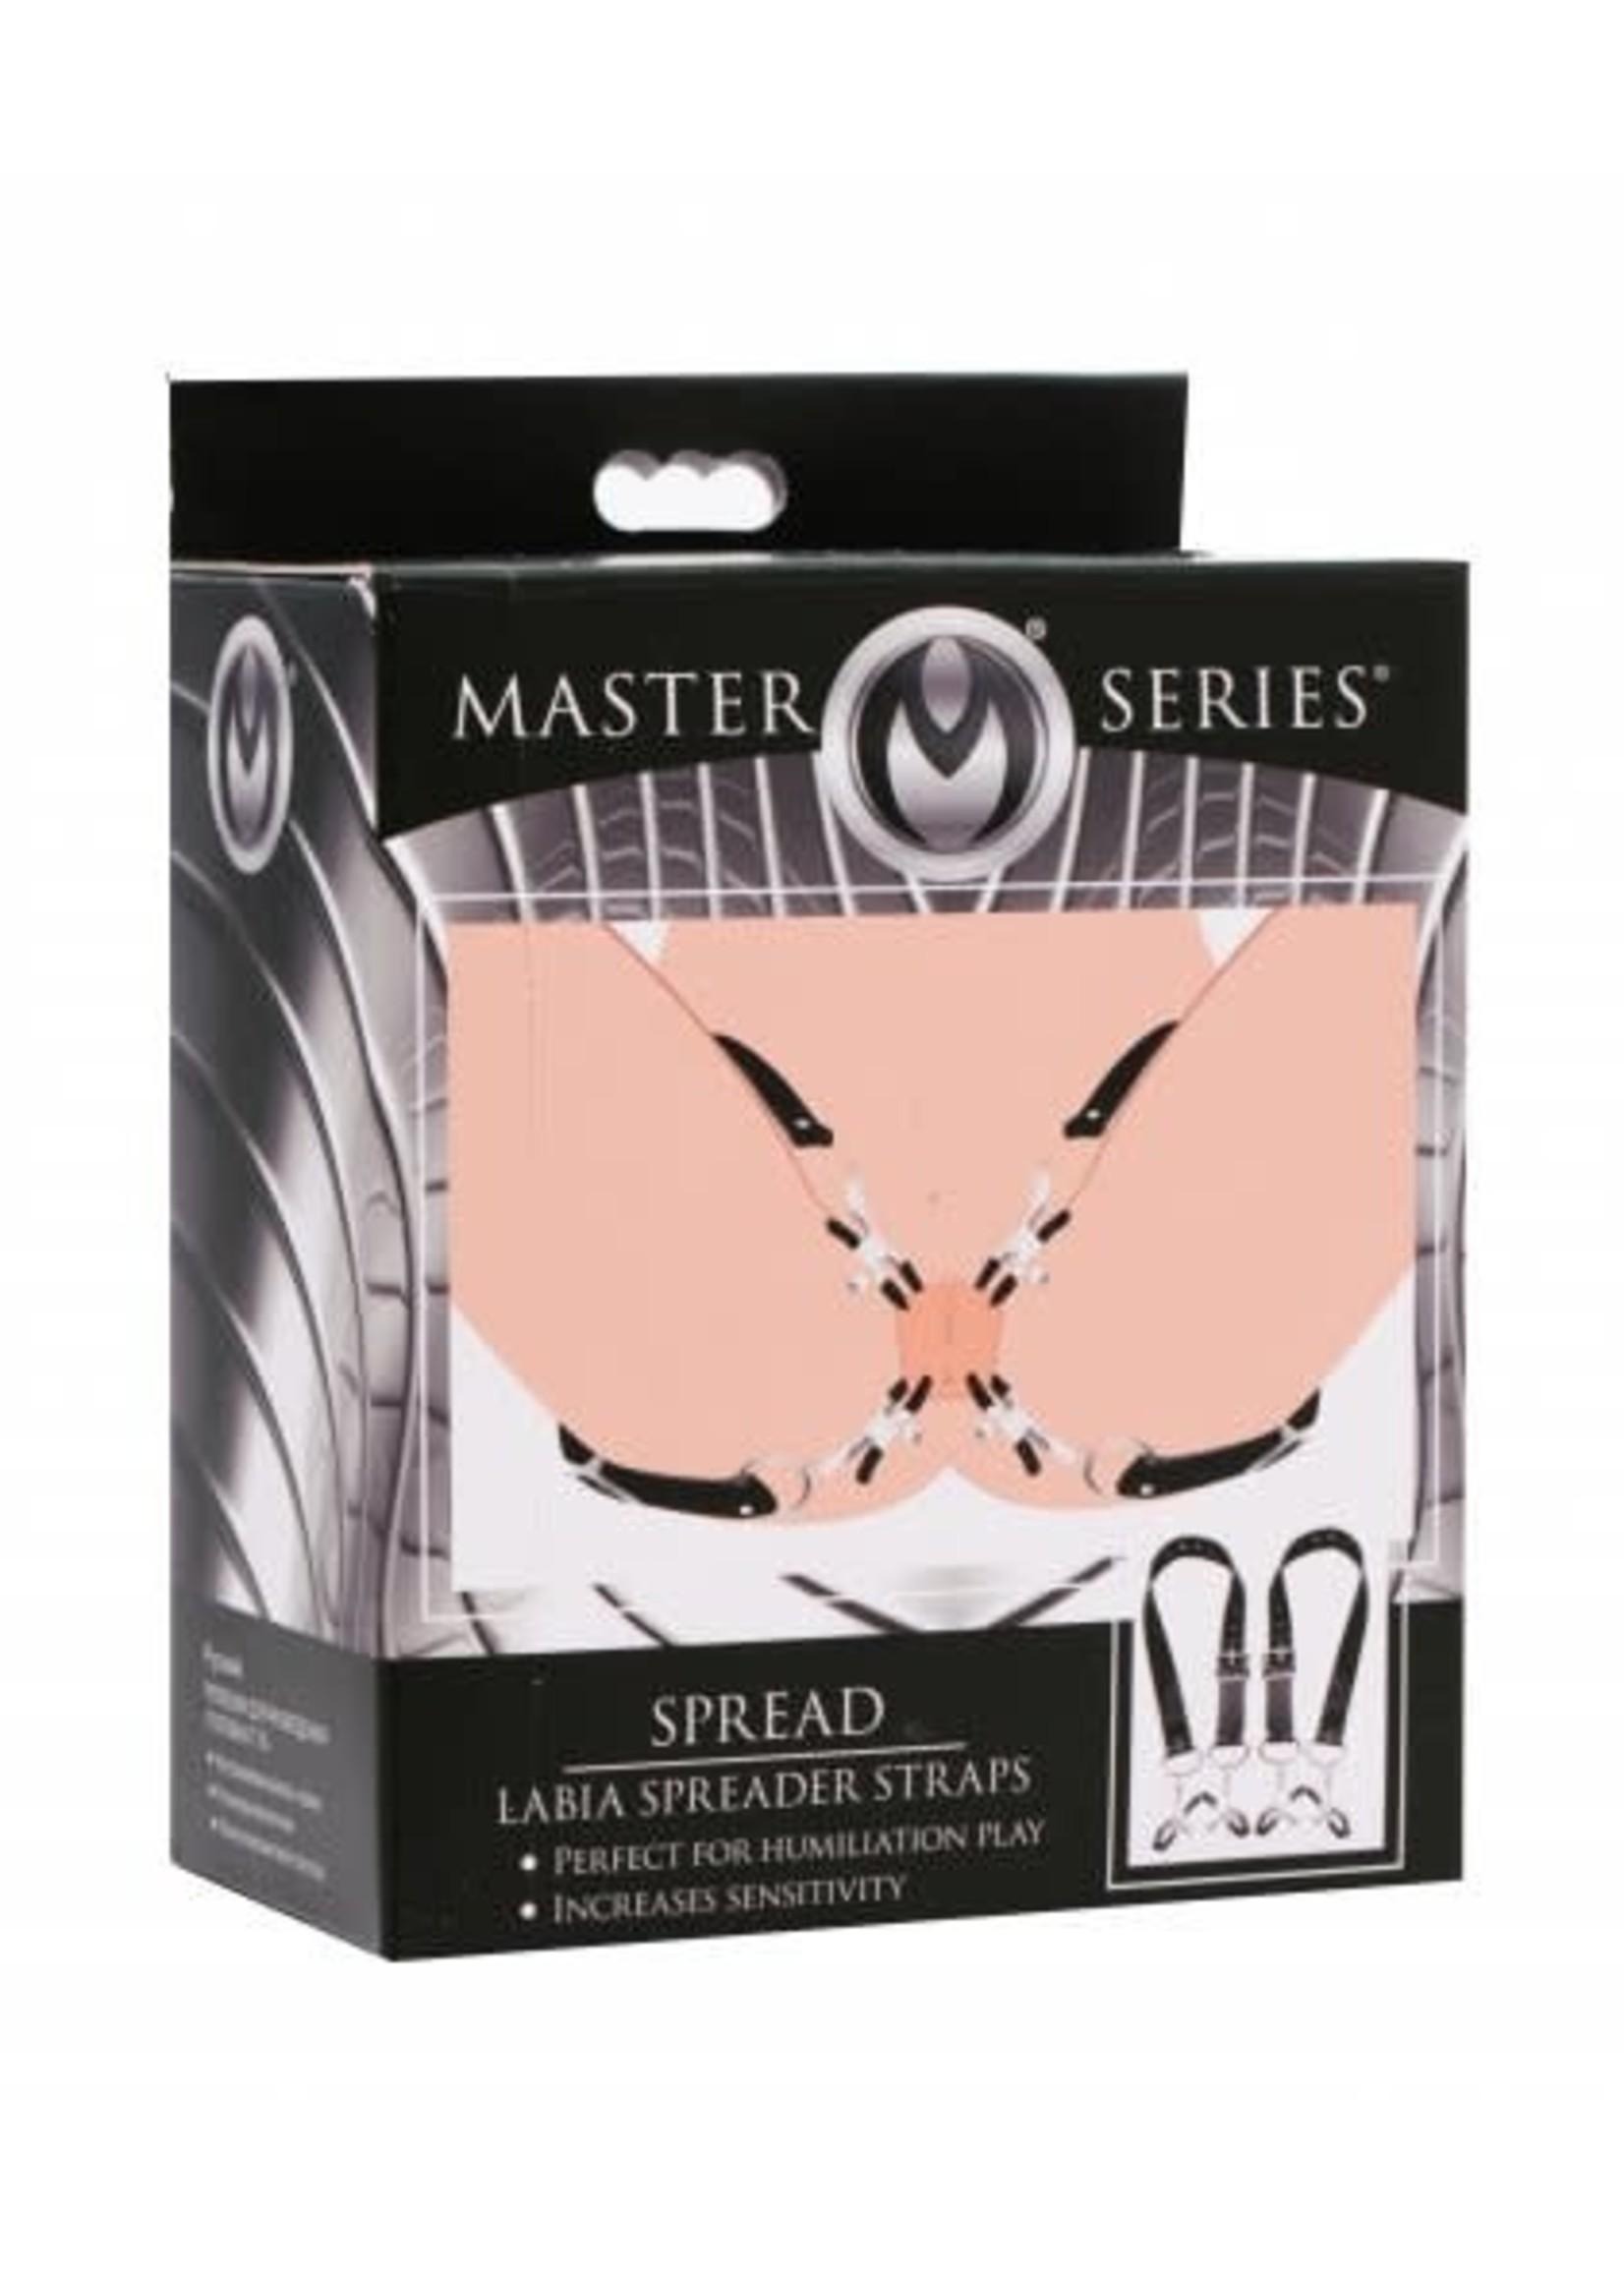 Labia Spreader Straps